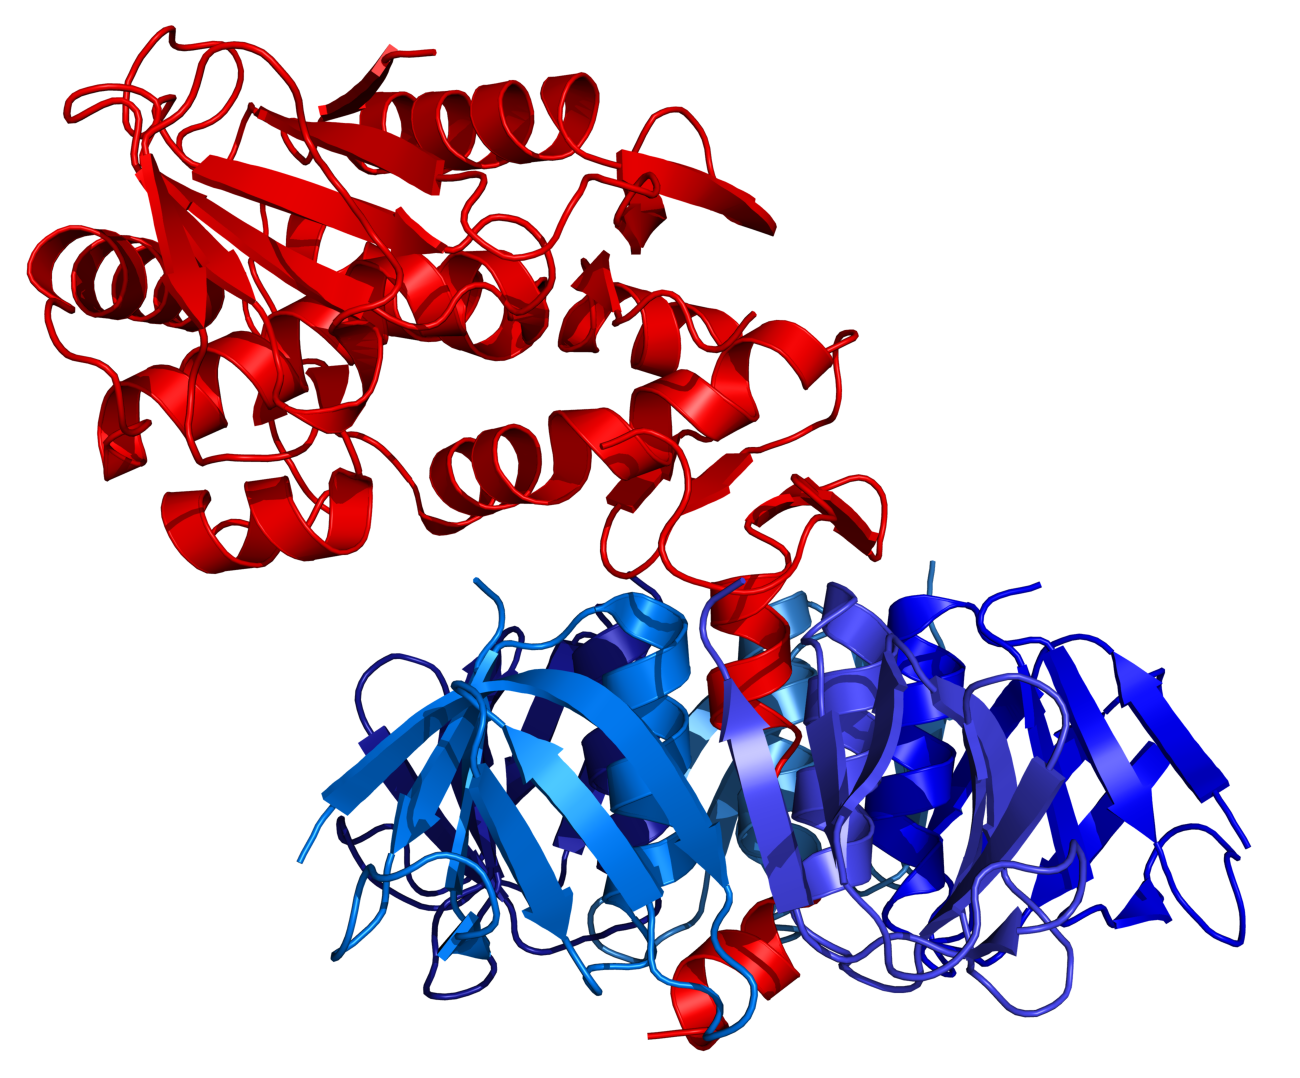 escherichia coli 0157h7 essay